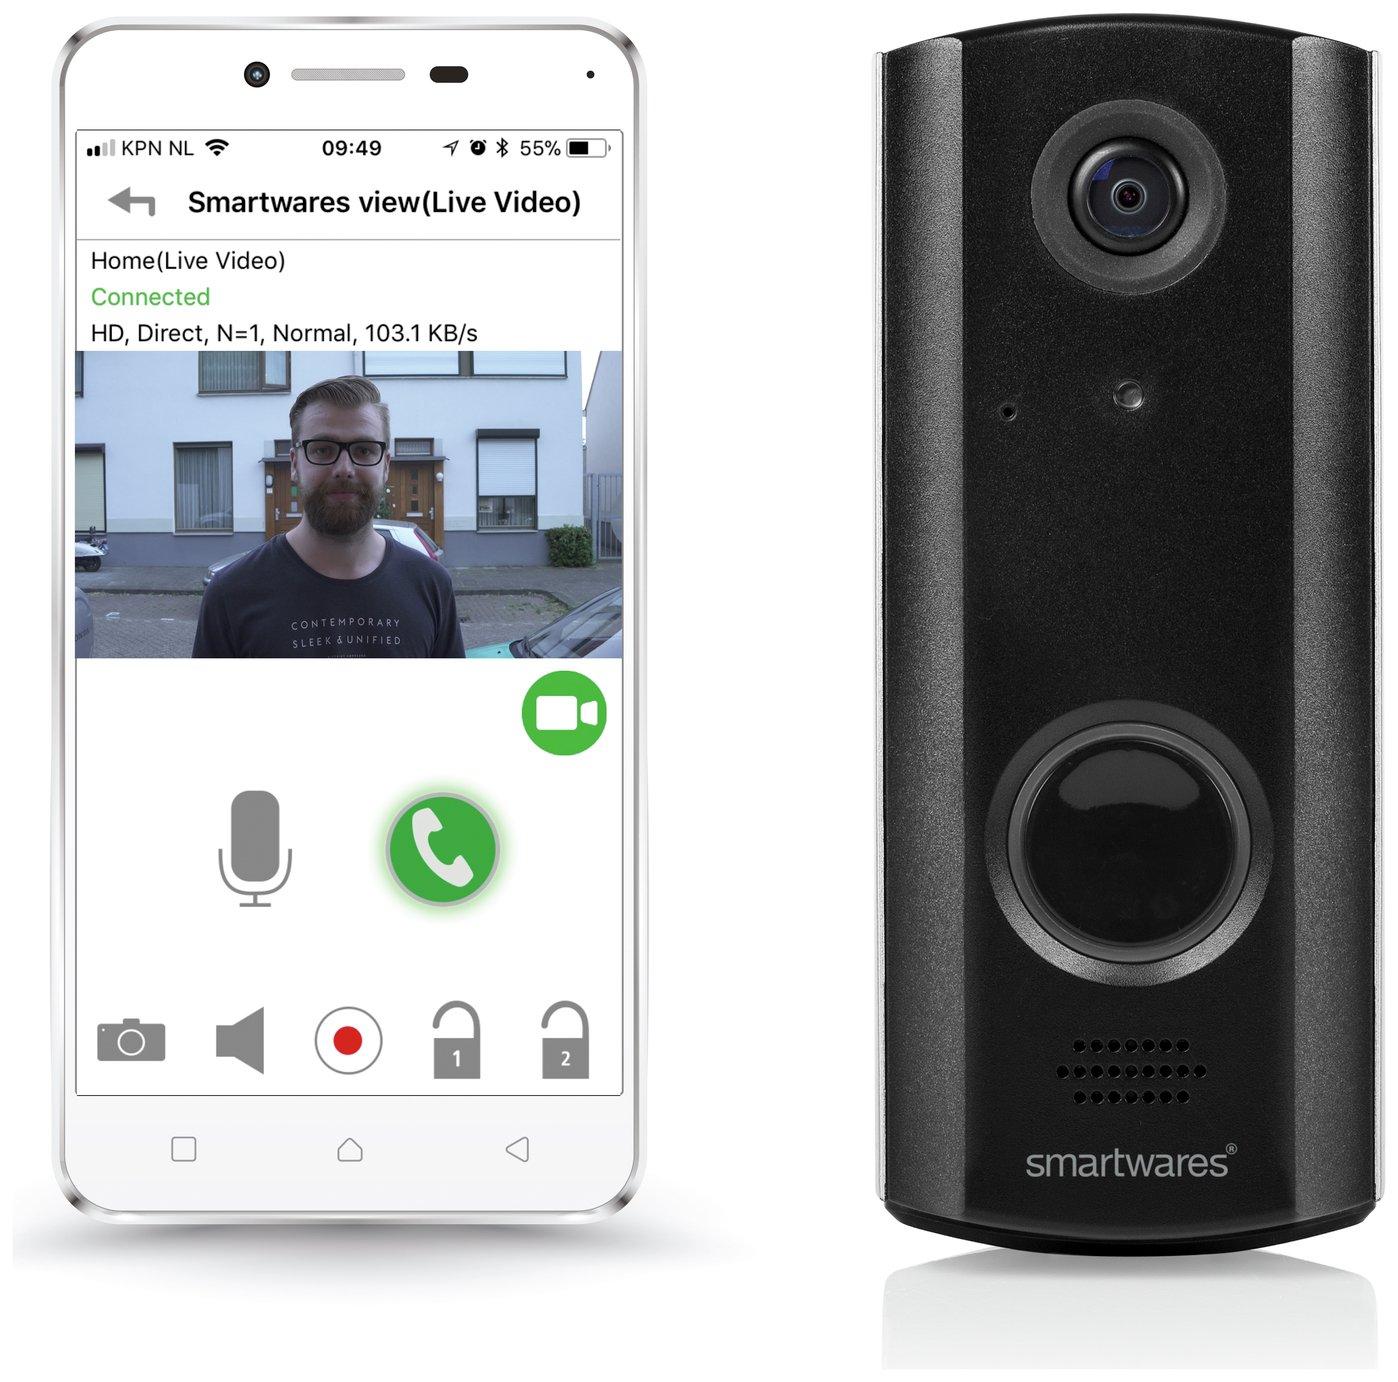 Byron WiFi Rechargeable Video Doorbell